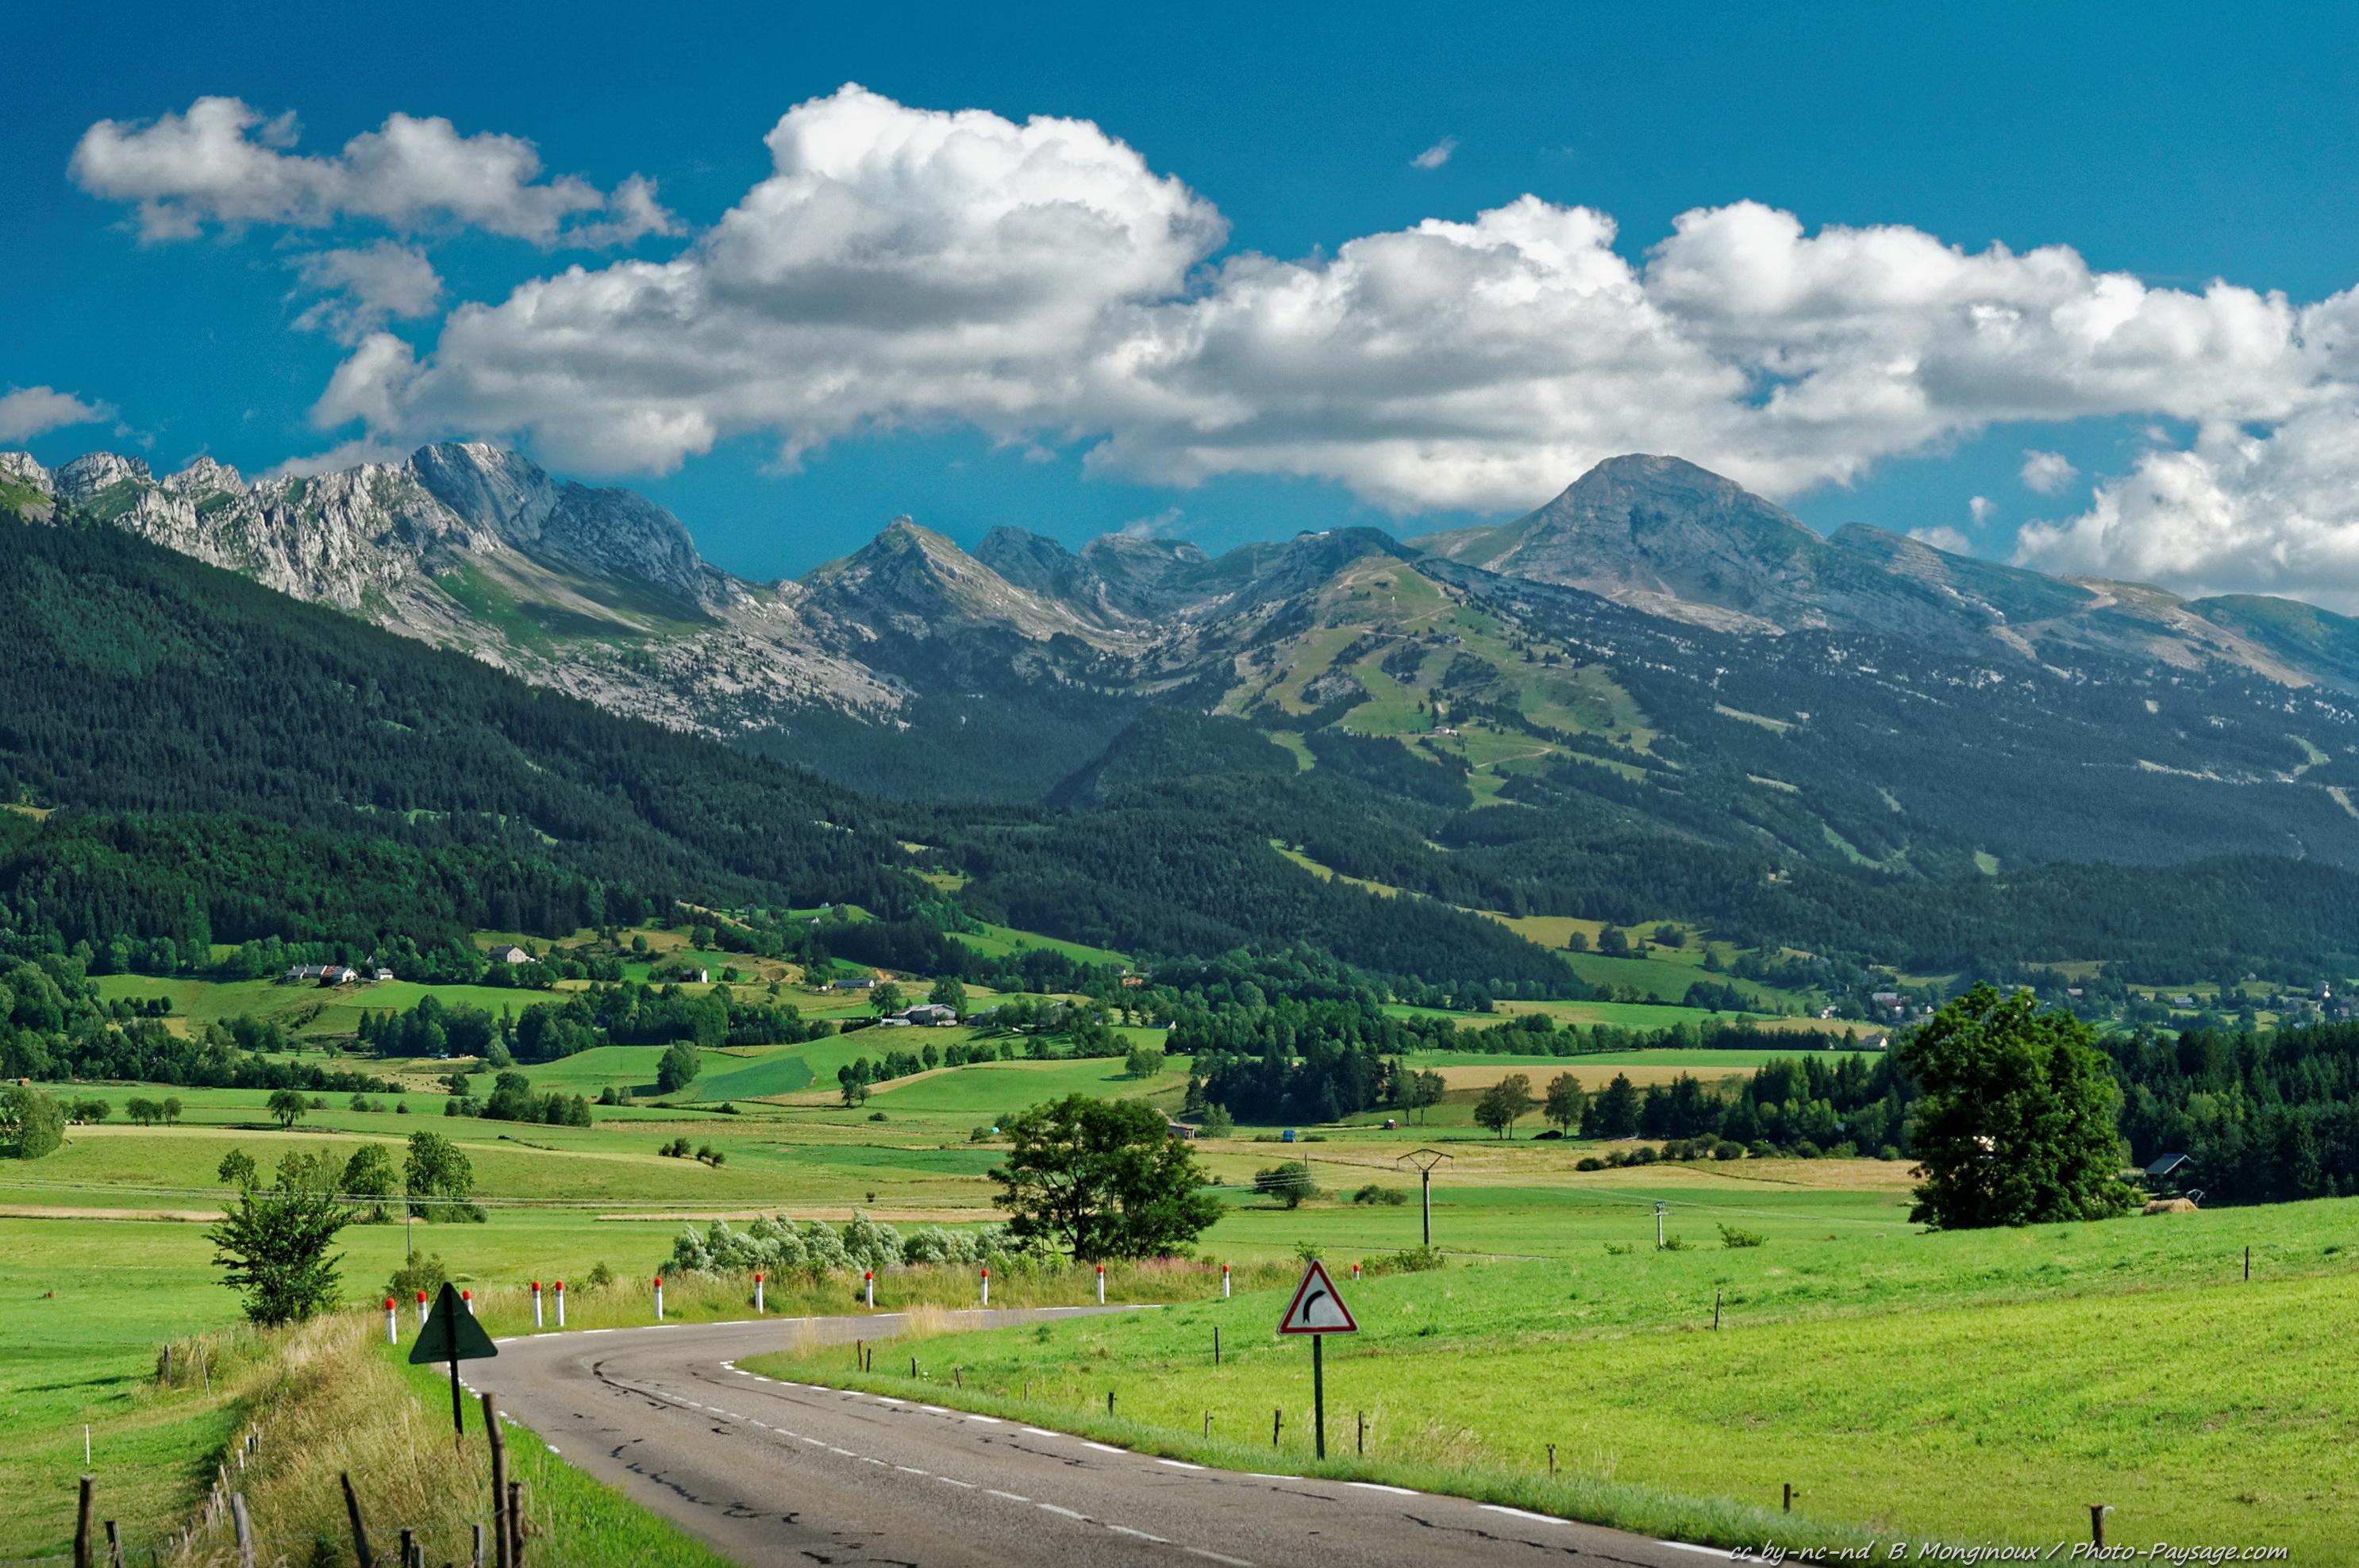 Parc naturel du vercors french alps my beautiful for Les paysages